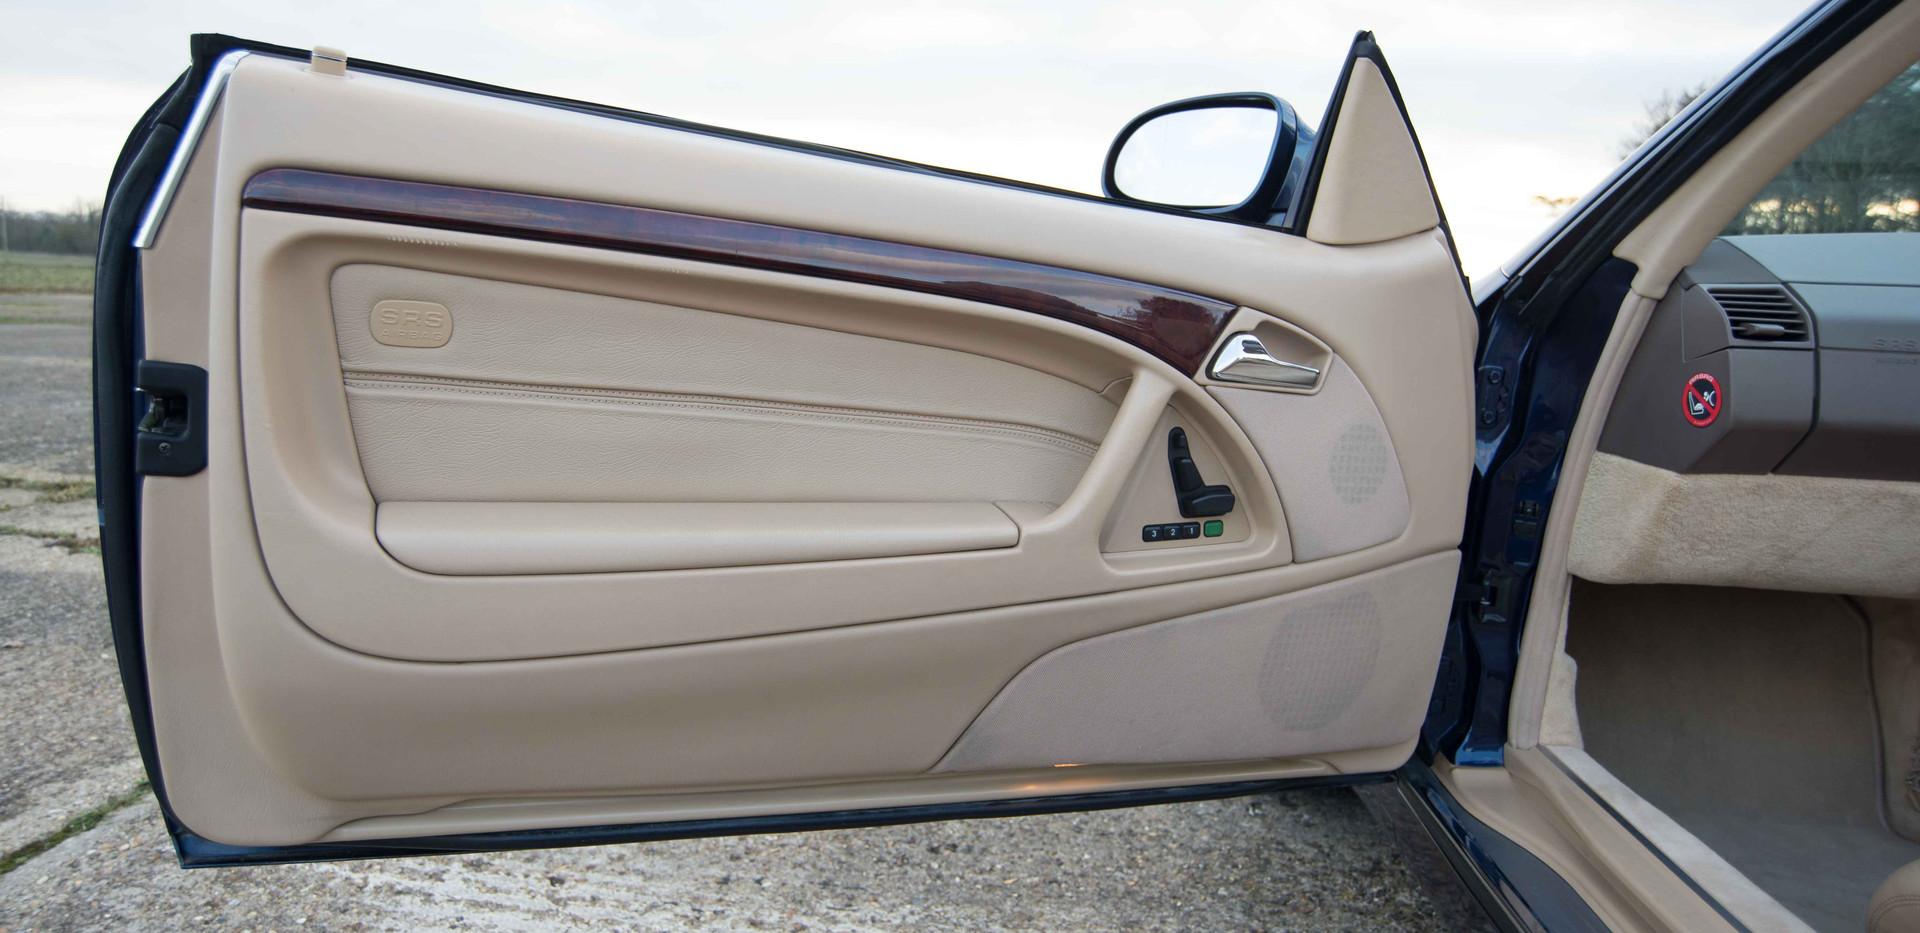 SL500 For Sale UK London  (34 of 36).jpg